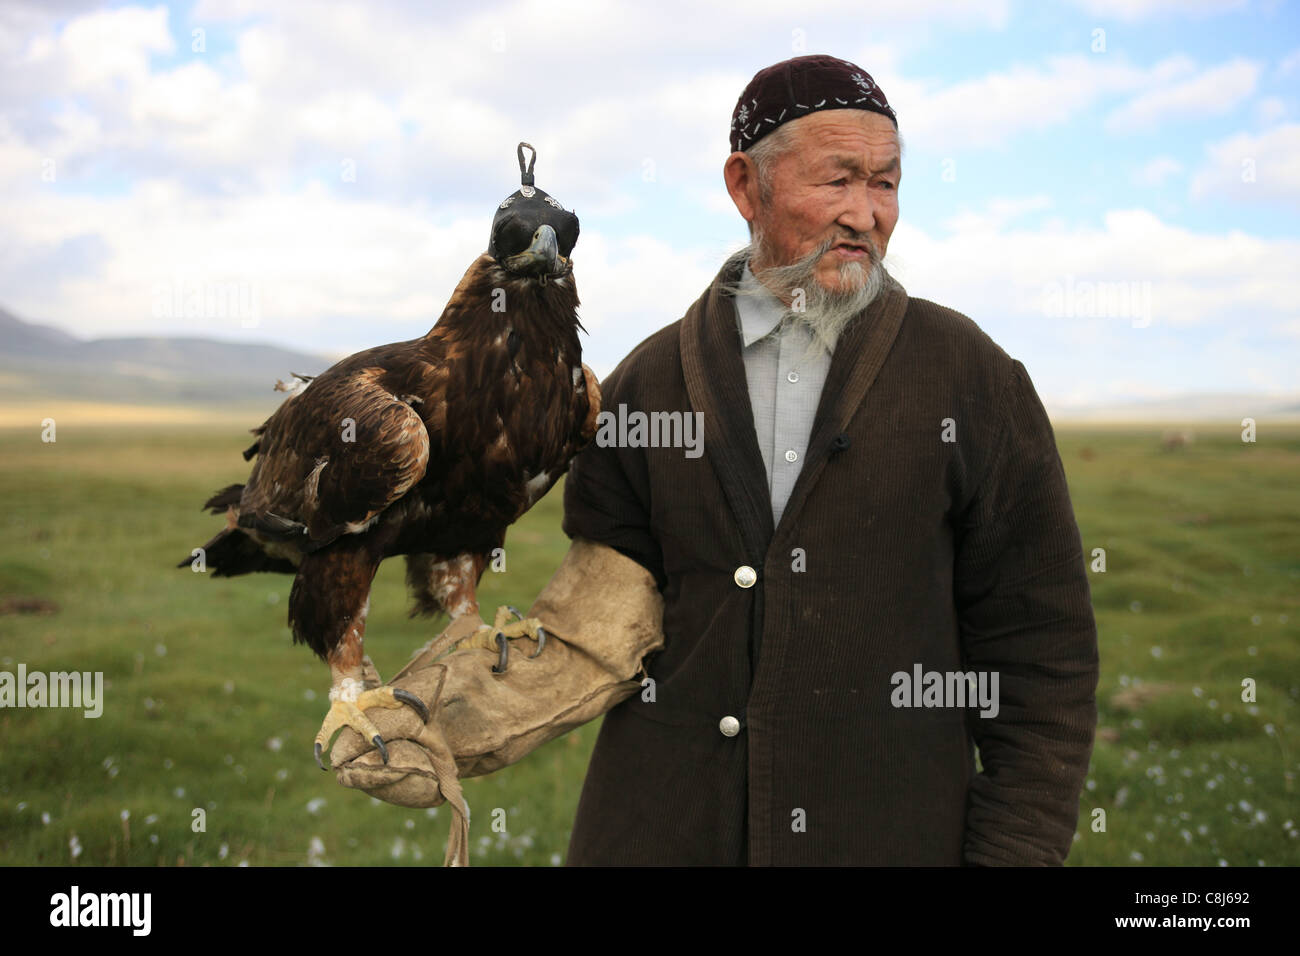 eagle hunter, bertutchy, Mongolia, Bayan Ulgii, Aimag, hunting, tradition, traditional, Kazakh, Western Mongolia, Stock Photo